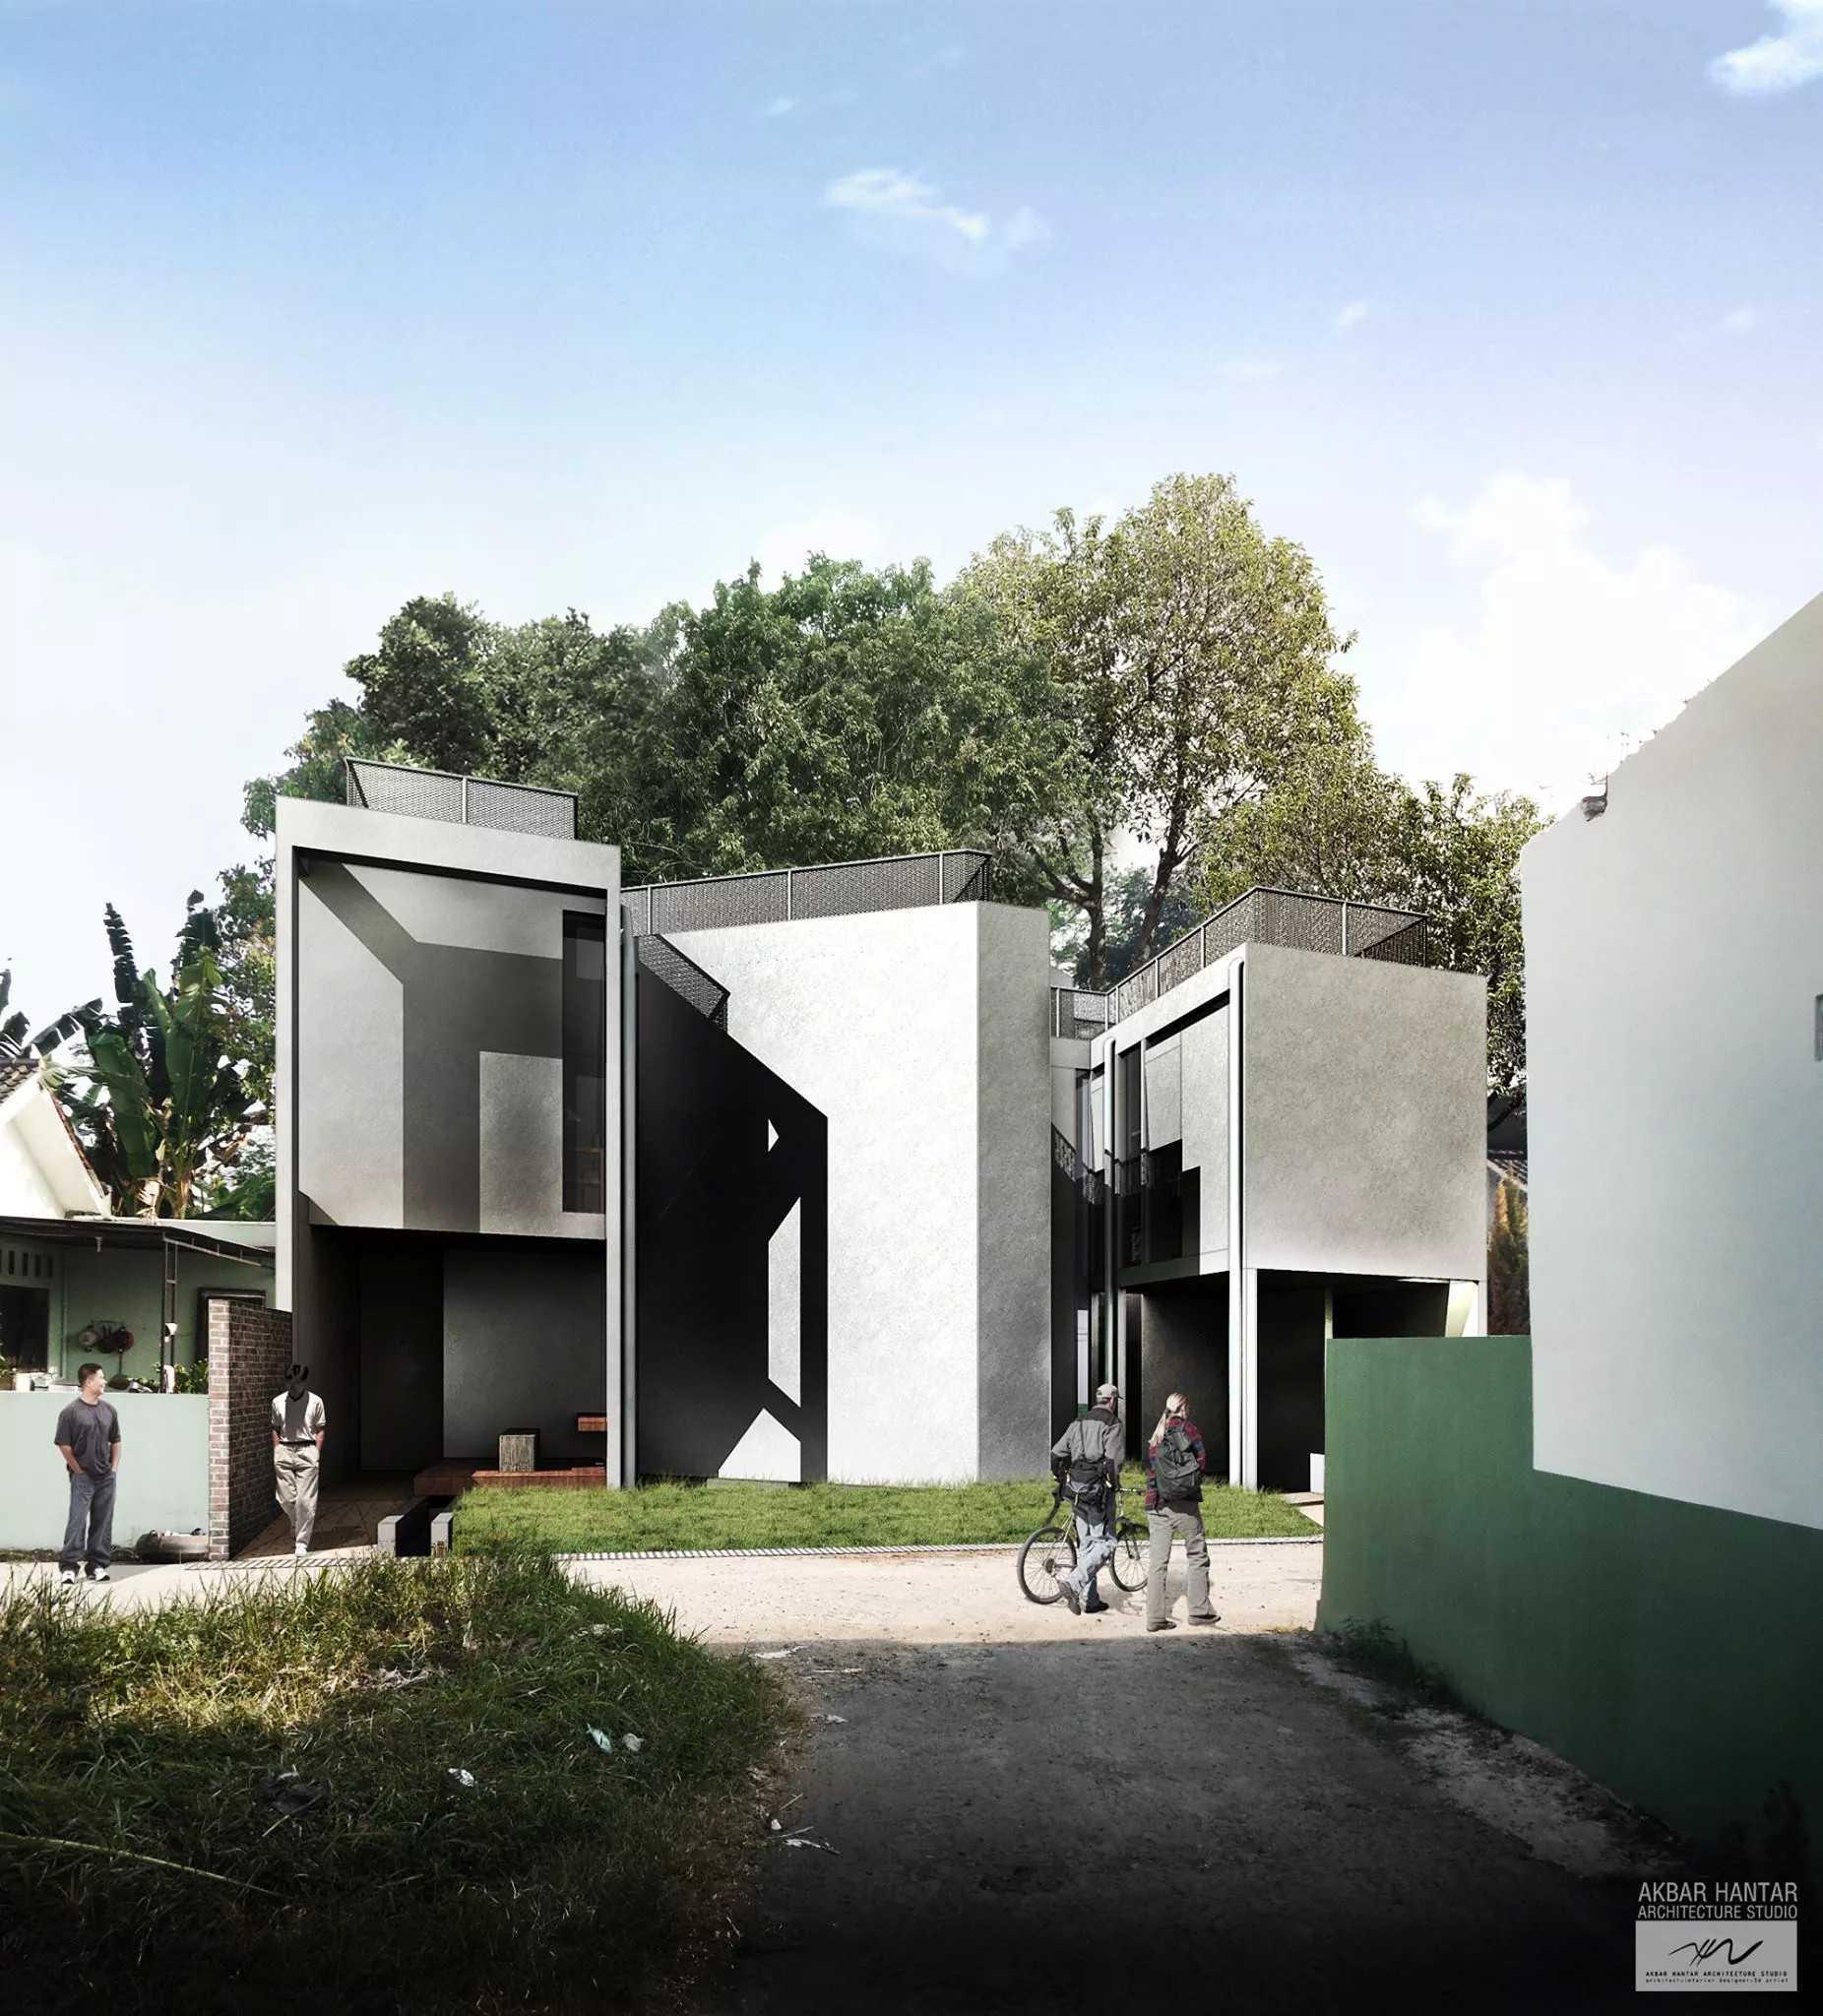 Akbar Hantar House At Purwokerto Purwokerto, Jawa Tengah Purwokerto, Jawa Tengah Front View   24266